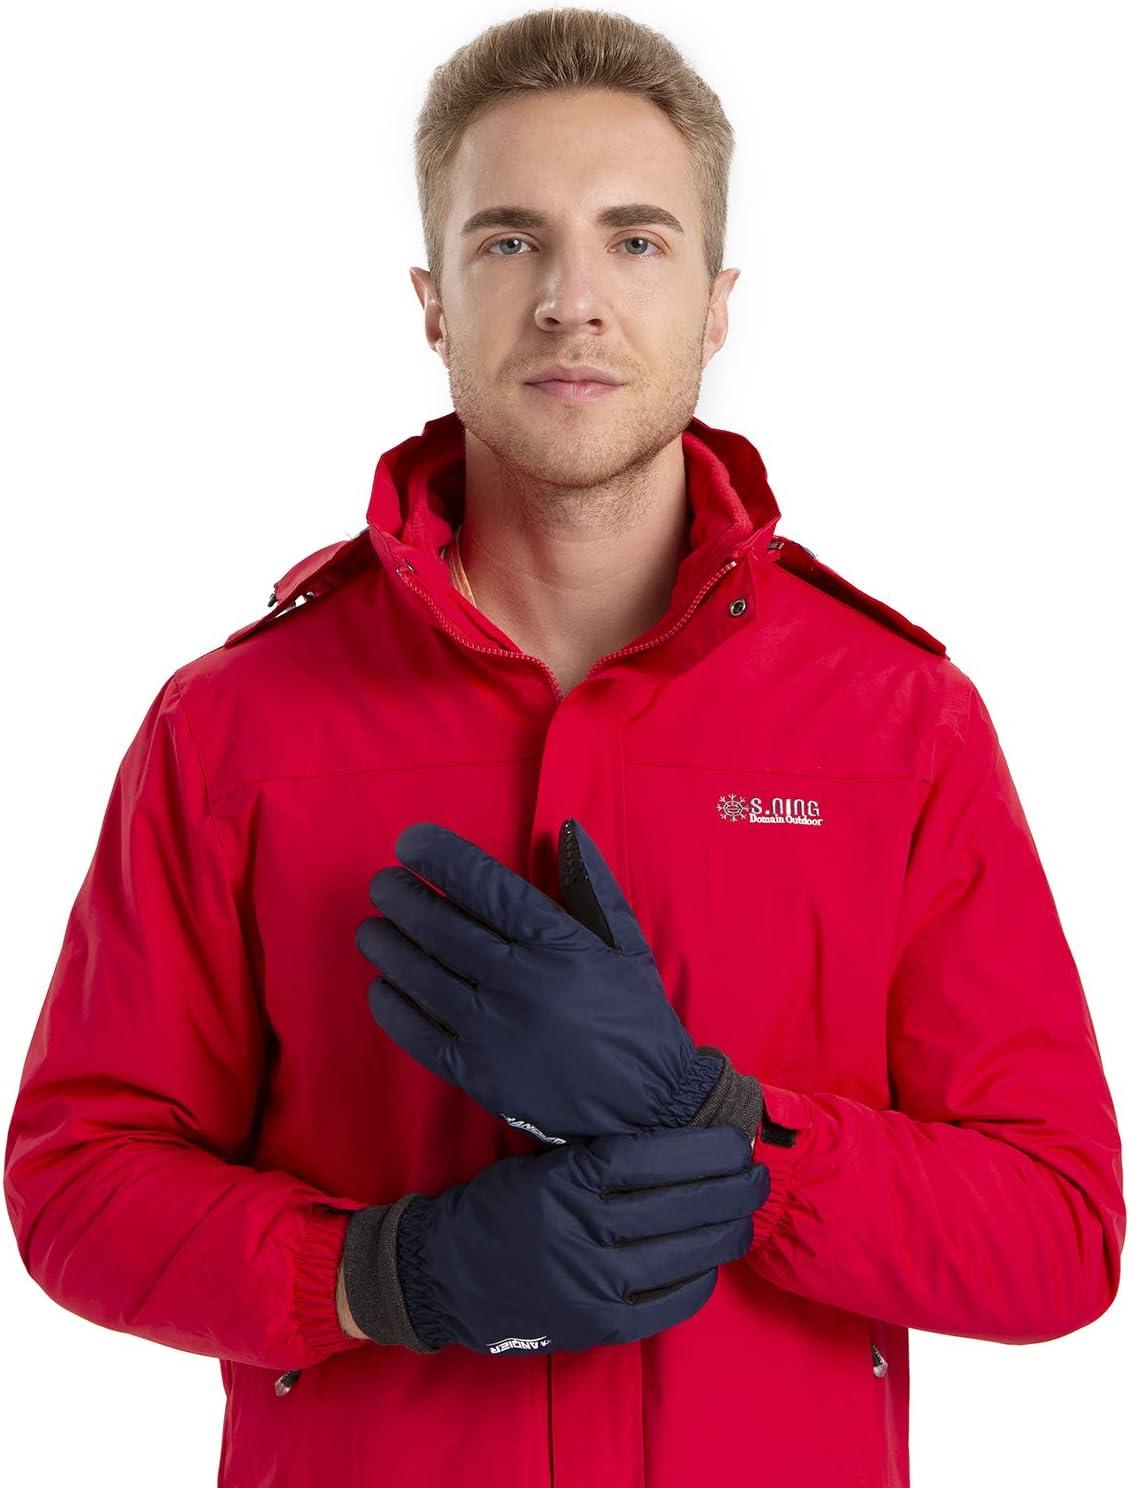 anqier Handschuhe Herren Damen Winddicht Fahrradhandschuhe Winter Sporthandschuhe Warm Winterhandschuhe zum Reiten Laufen Running Wandern Motorrad mit Fleecefutter